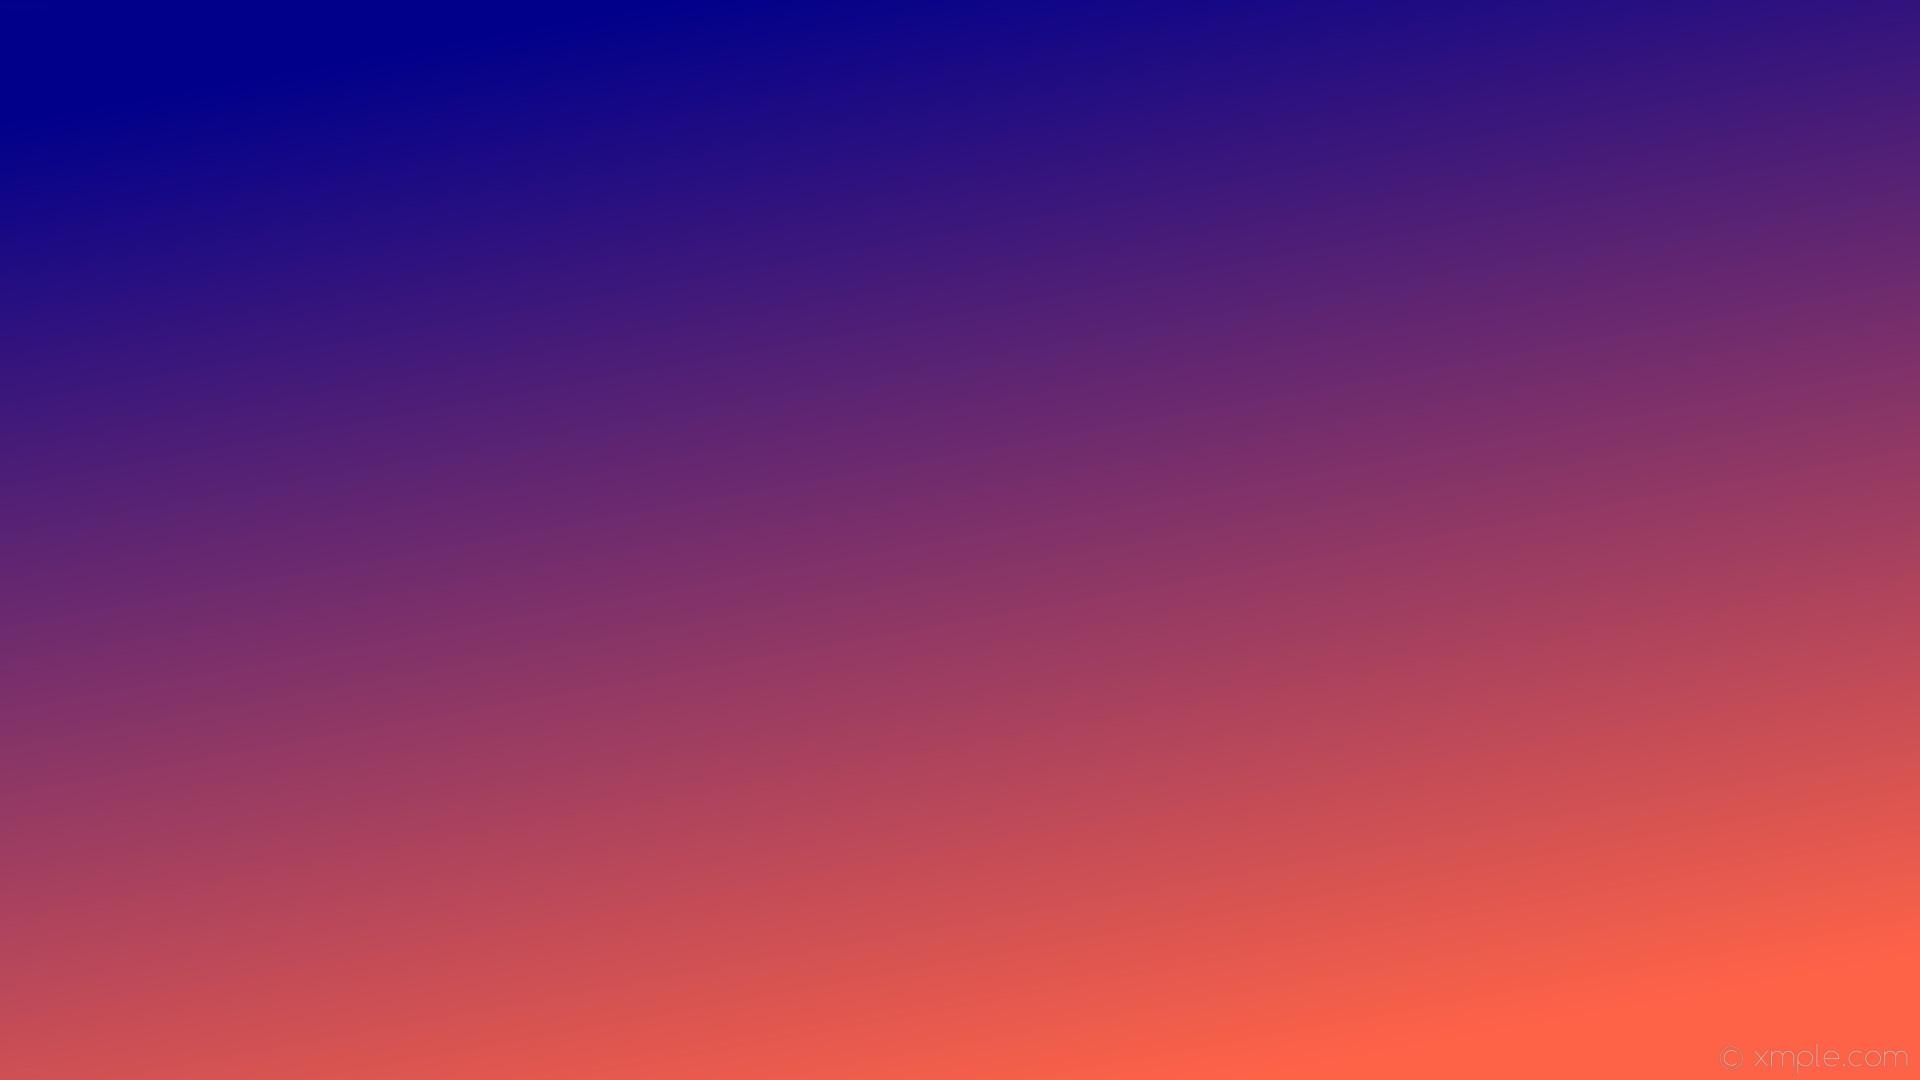 wallpaper gradient blue orange linear dark blue tomato #00008b #ff6347 120°